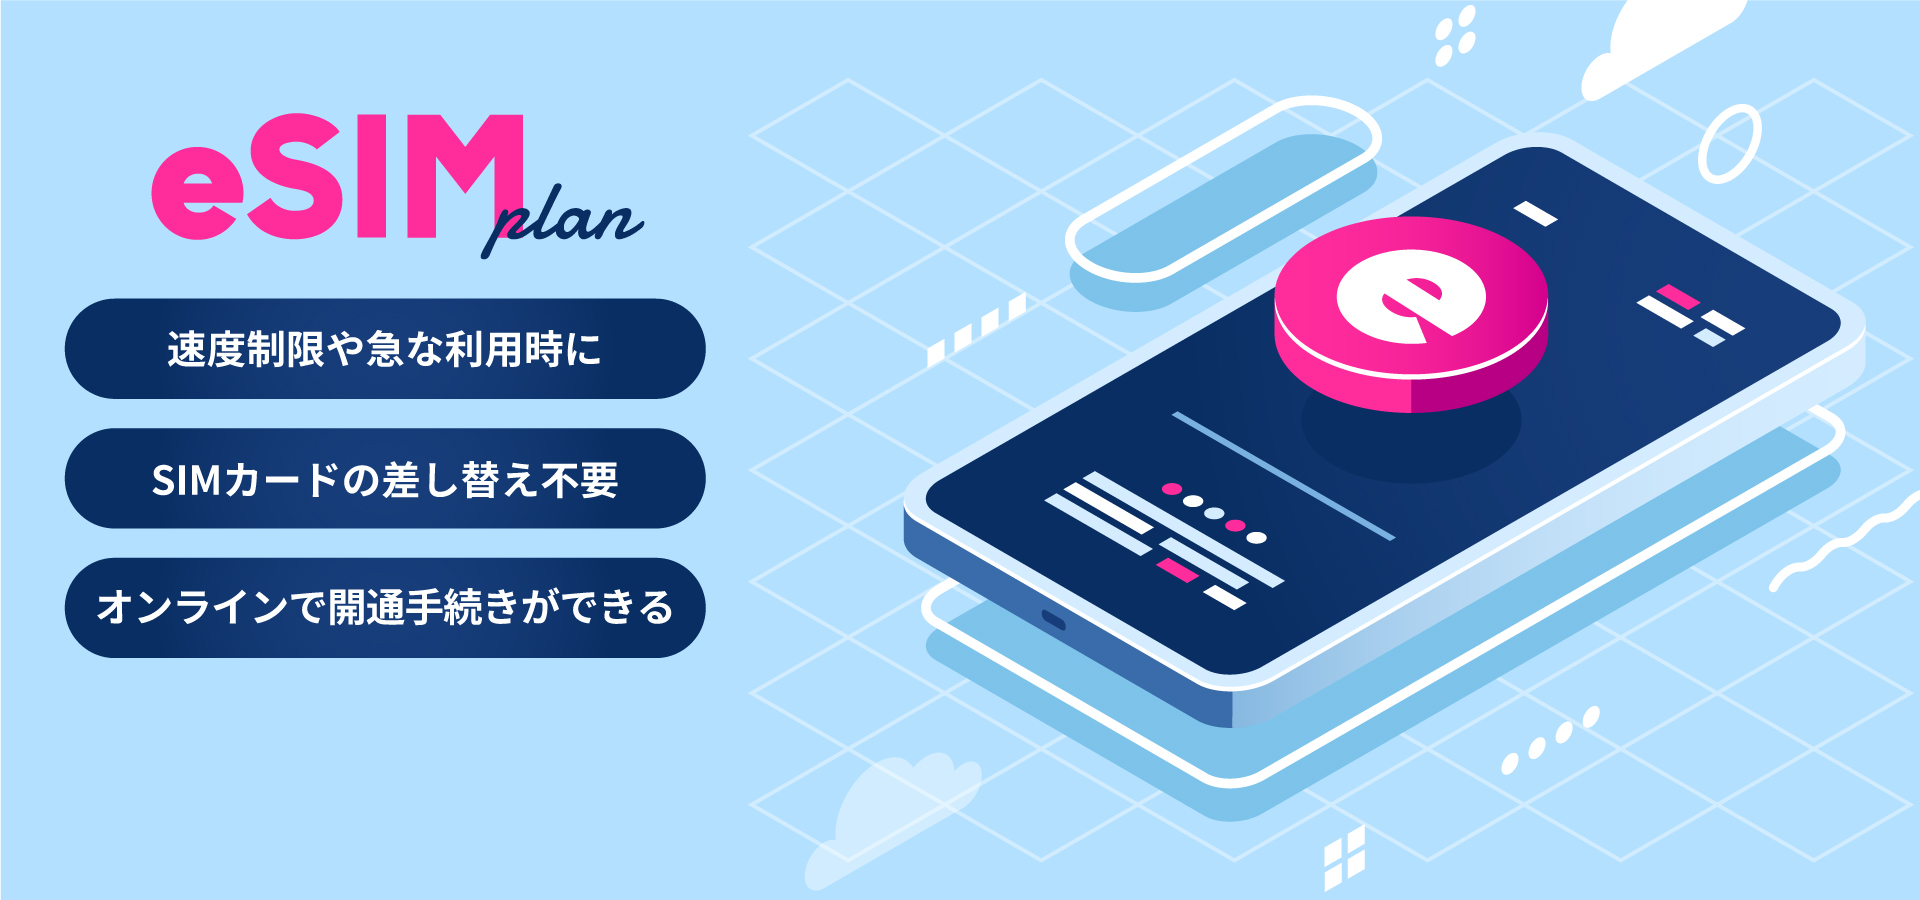 SoftBank大容量プリペイドSIM1